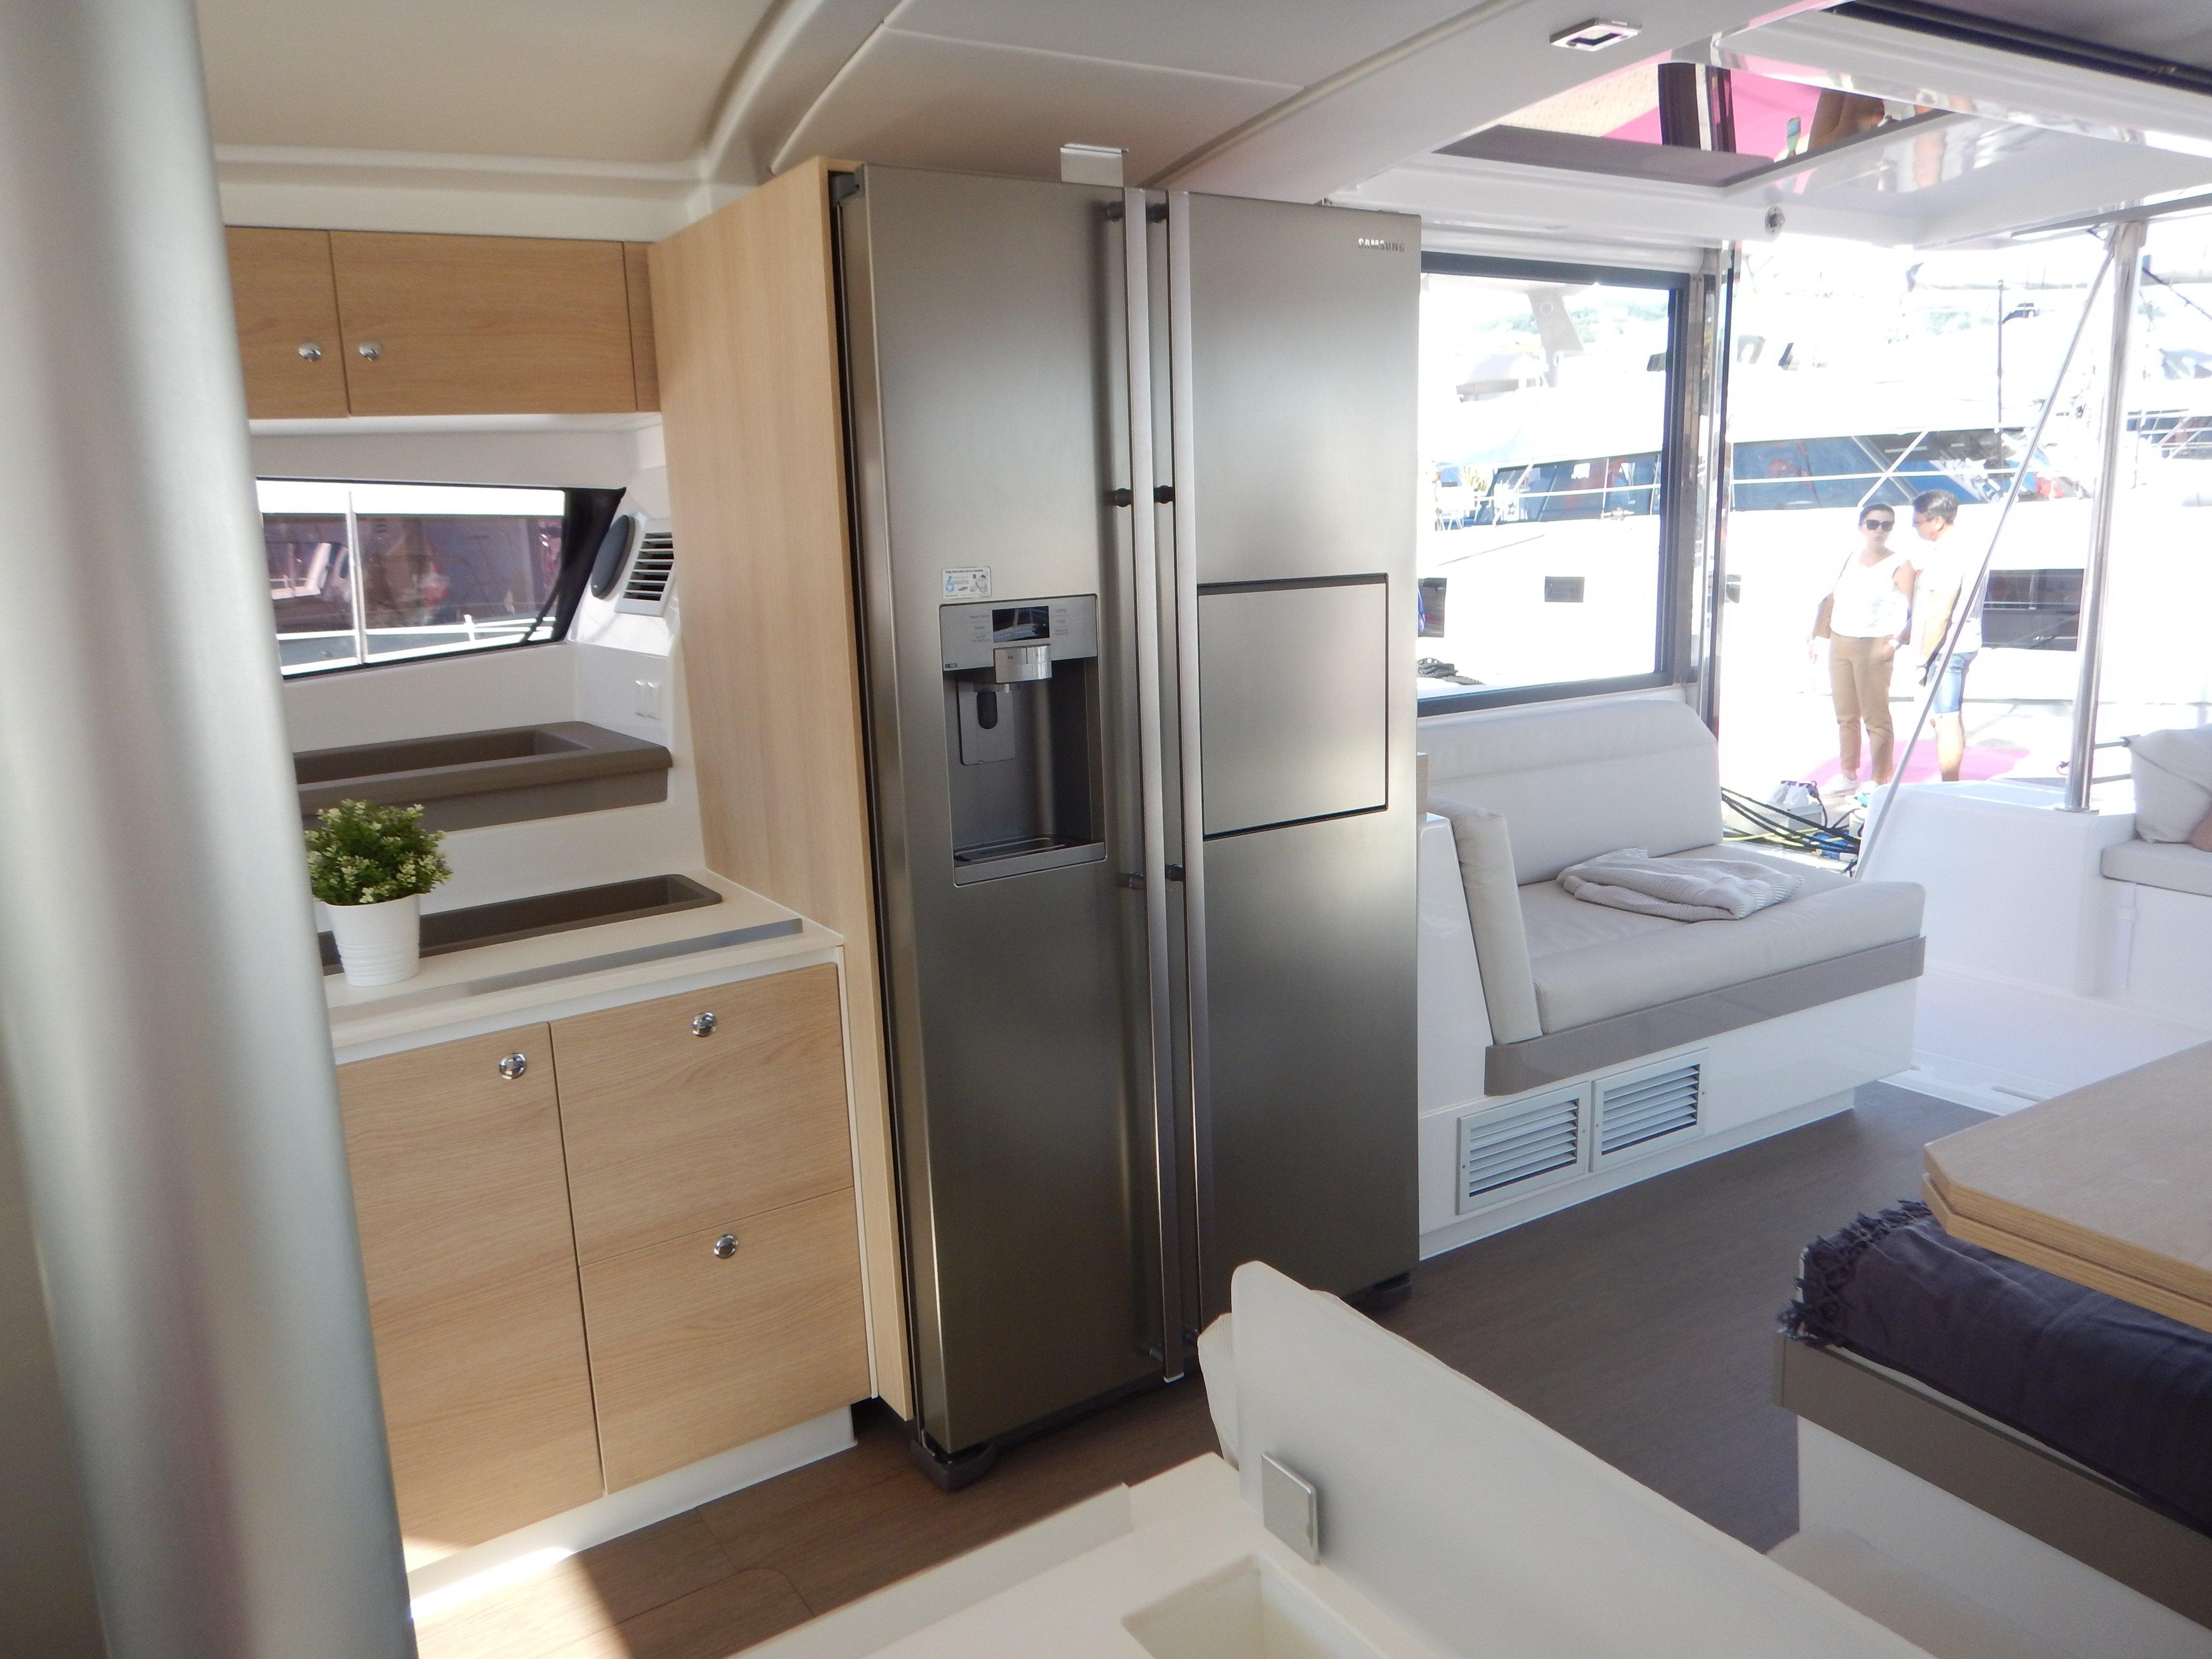 Bali 4.3 - 4 double cabins (Carpe Ventum)  - 3